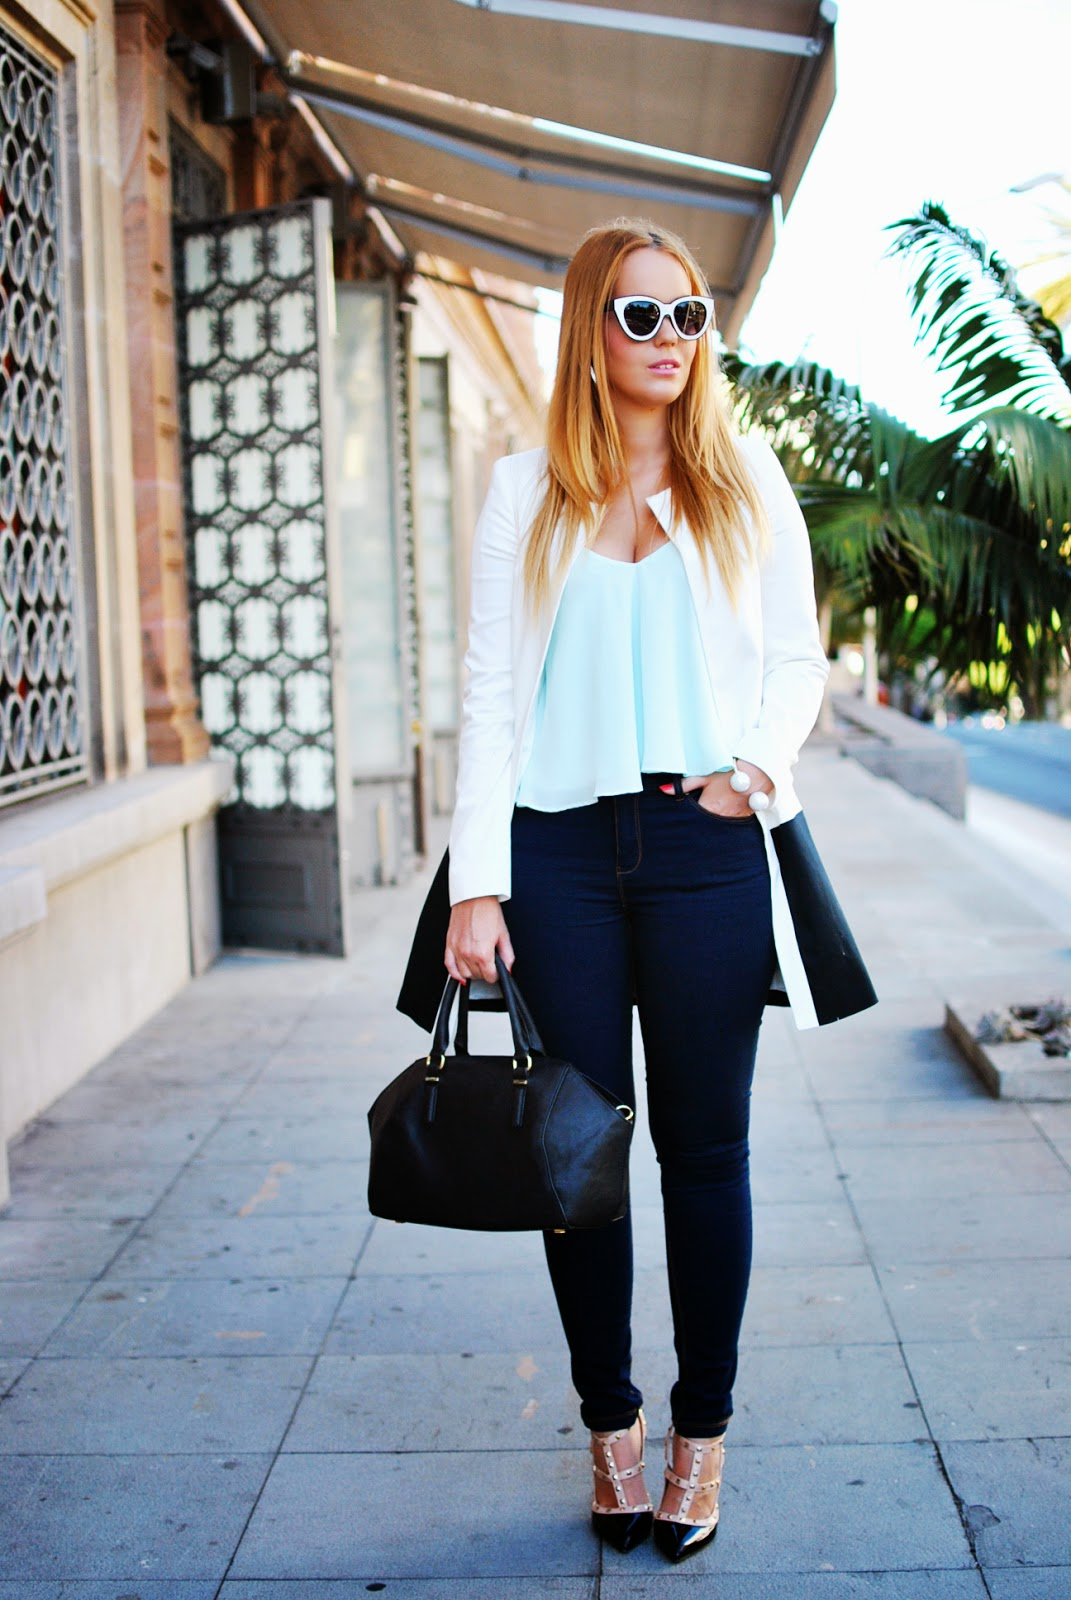 mom jeans high-waisted,pantalones de mamá, zerouv, very simple, valention clon, crop top, nery hdez